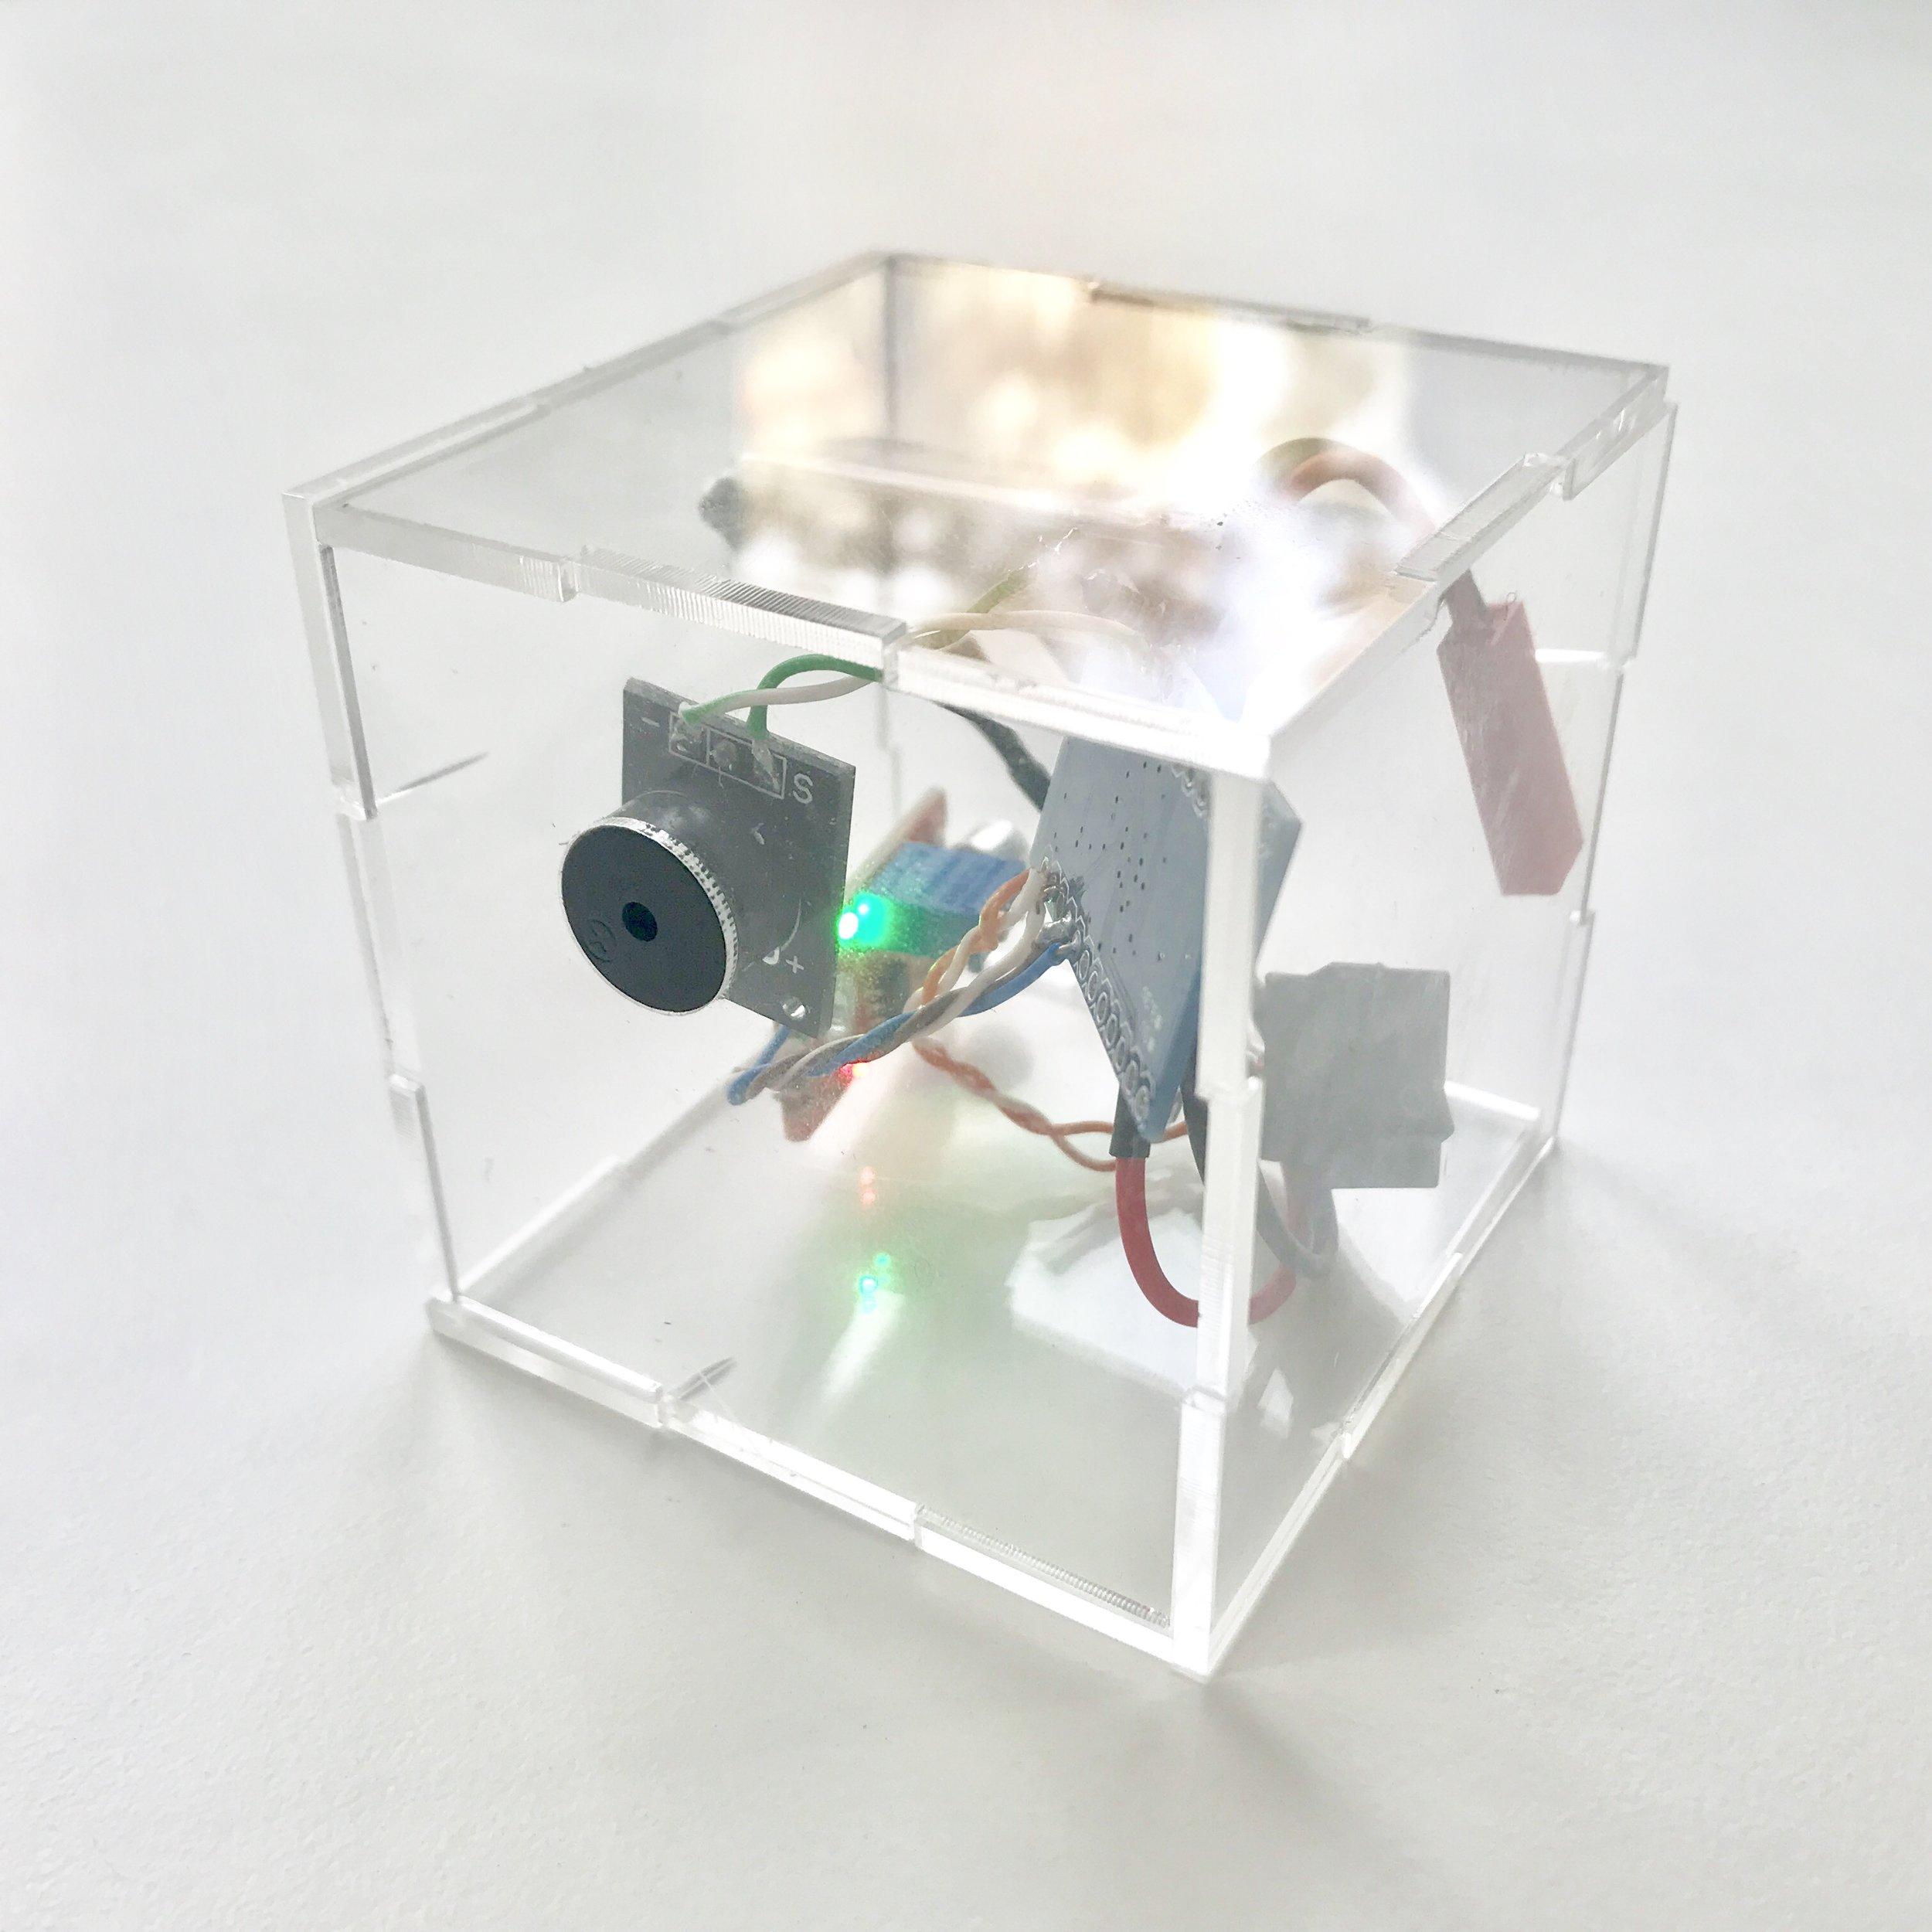 Sound sensor + buzzer box